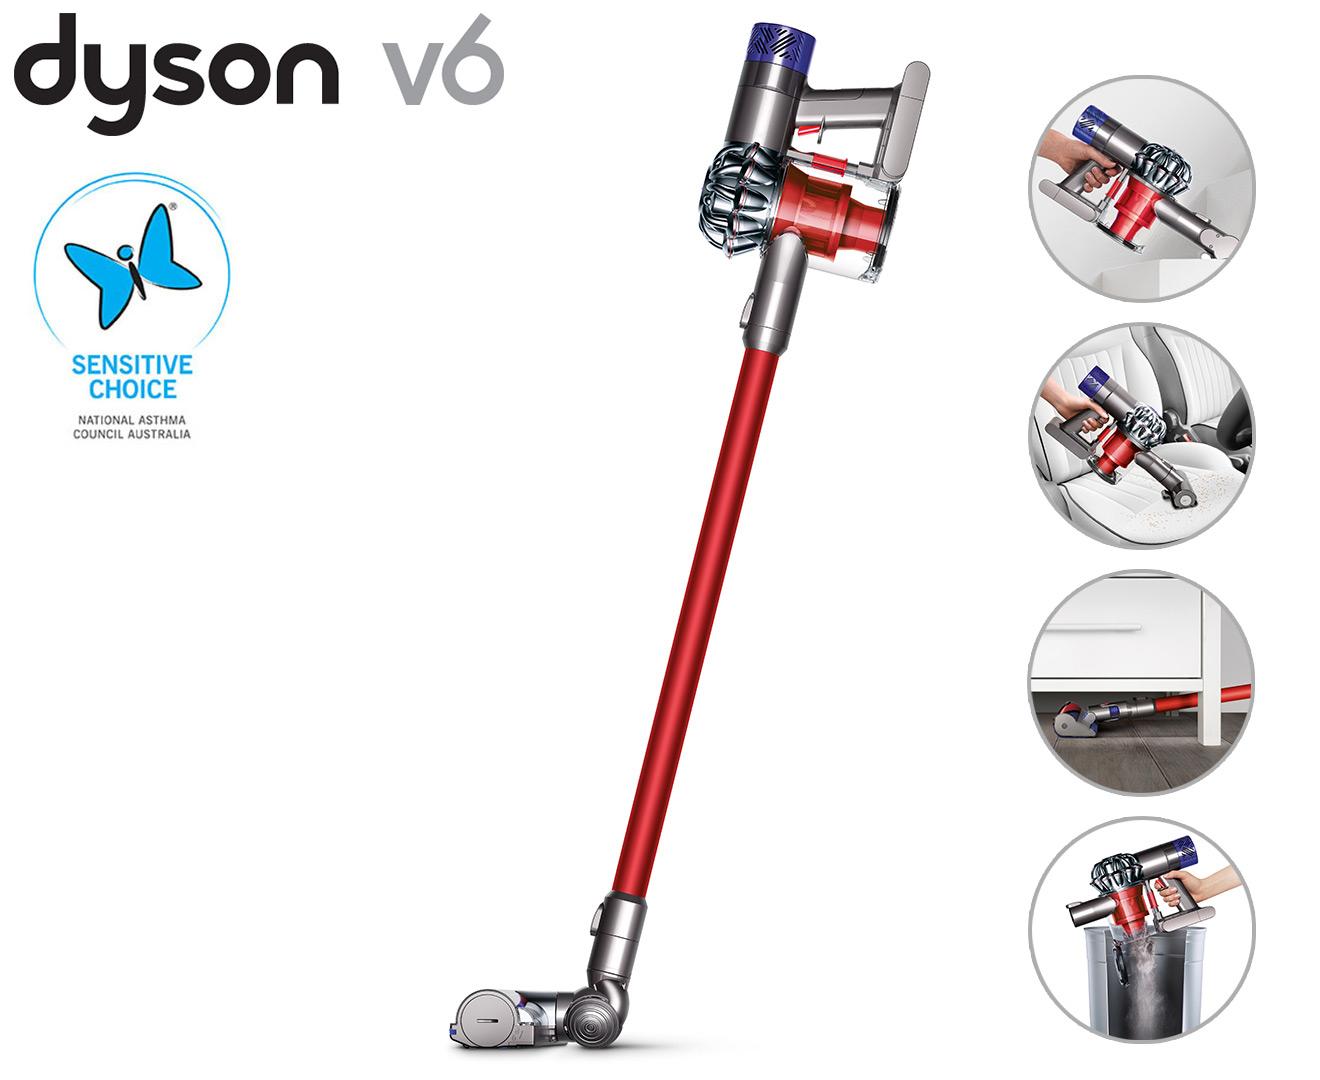 dyson wand v6 manual pdf